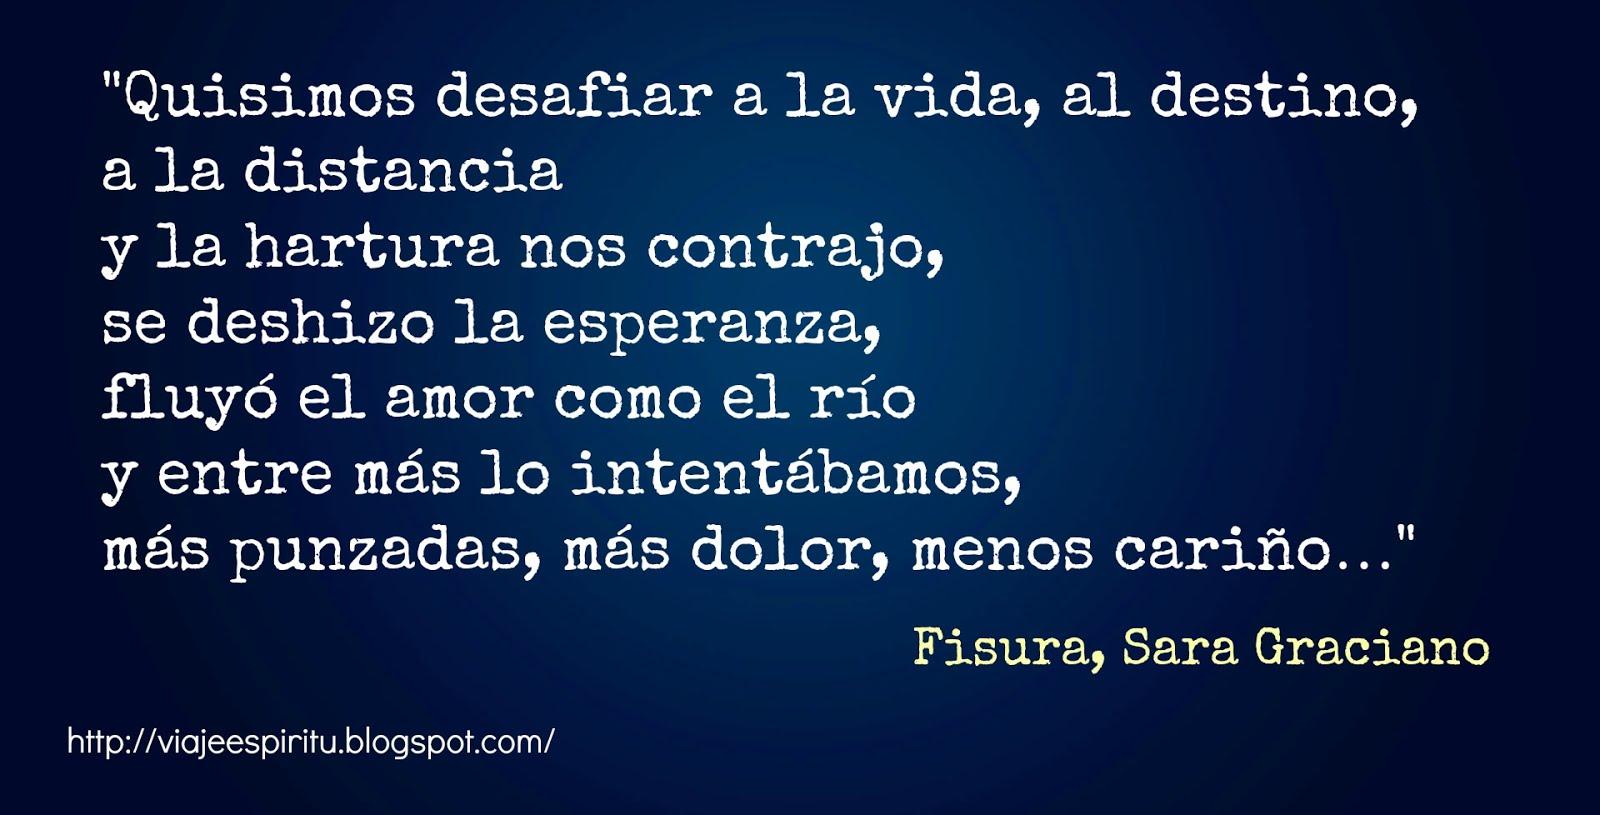 Fisura, Sara Graciano